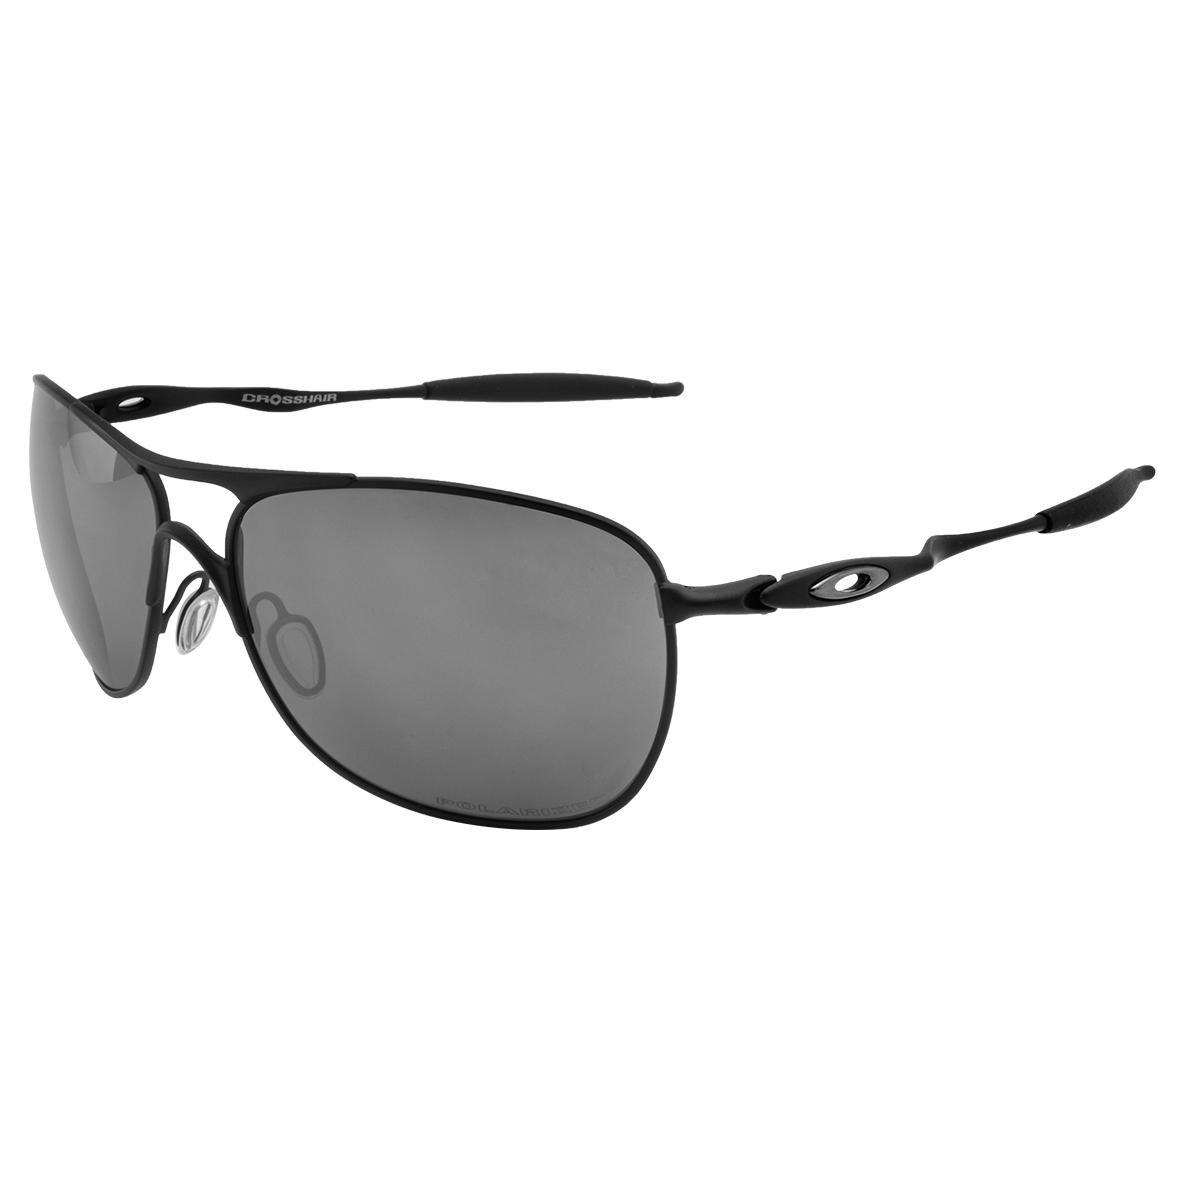 ... Óculos de Sol Oakley Crosshair Matte Black   Black Iridium Polarized -  10 61 03c2895c06